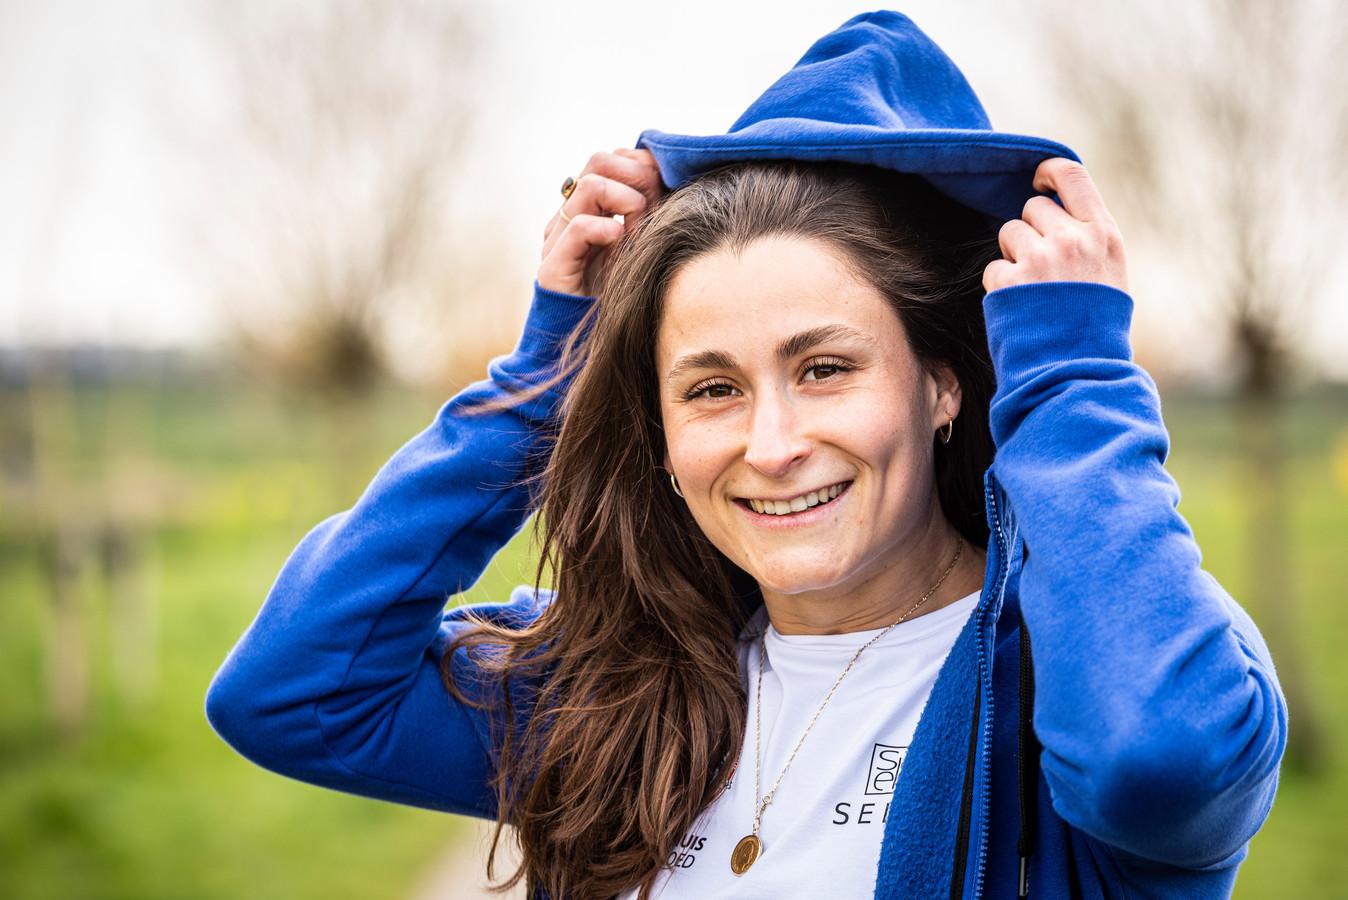 Waterpoloster Isabella van Toorn is met GZC DONK titelverdedigster.